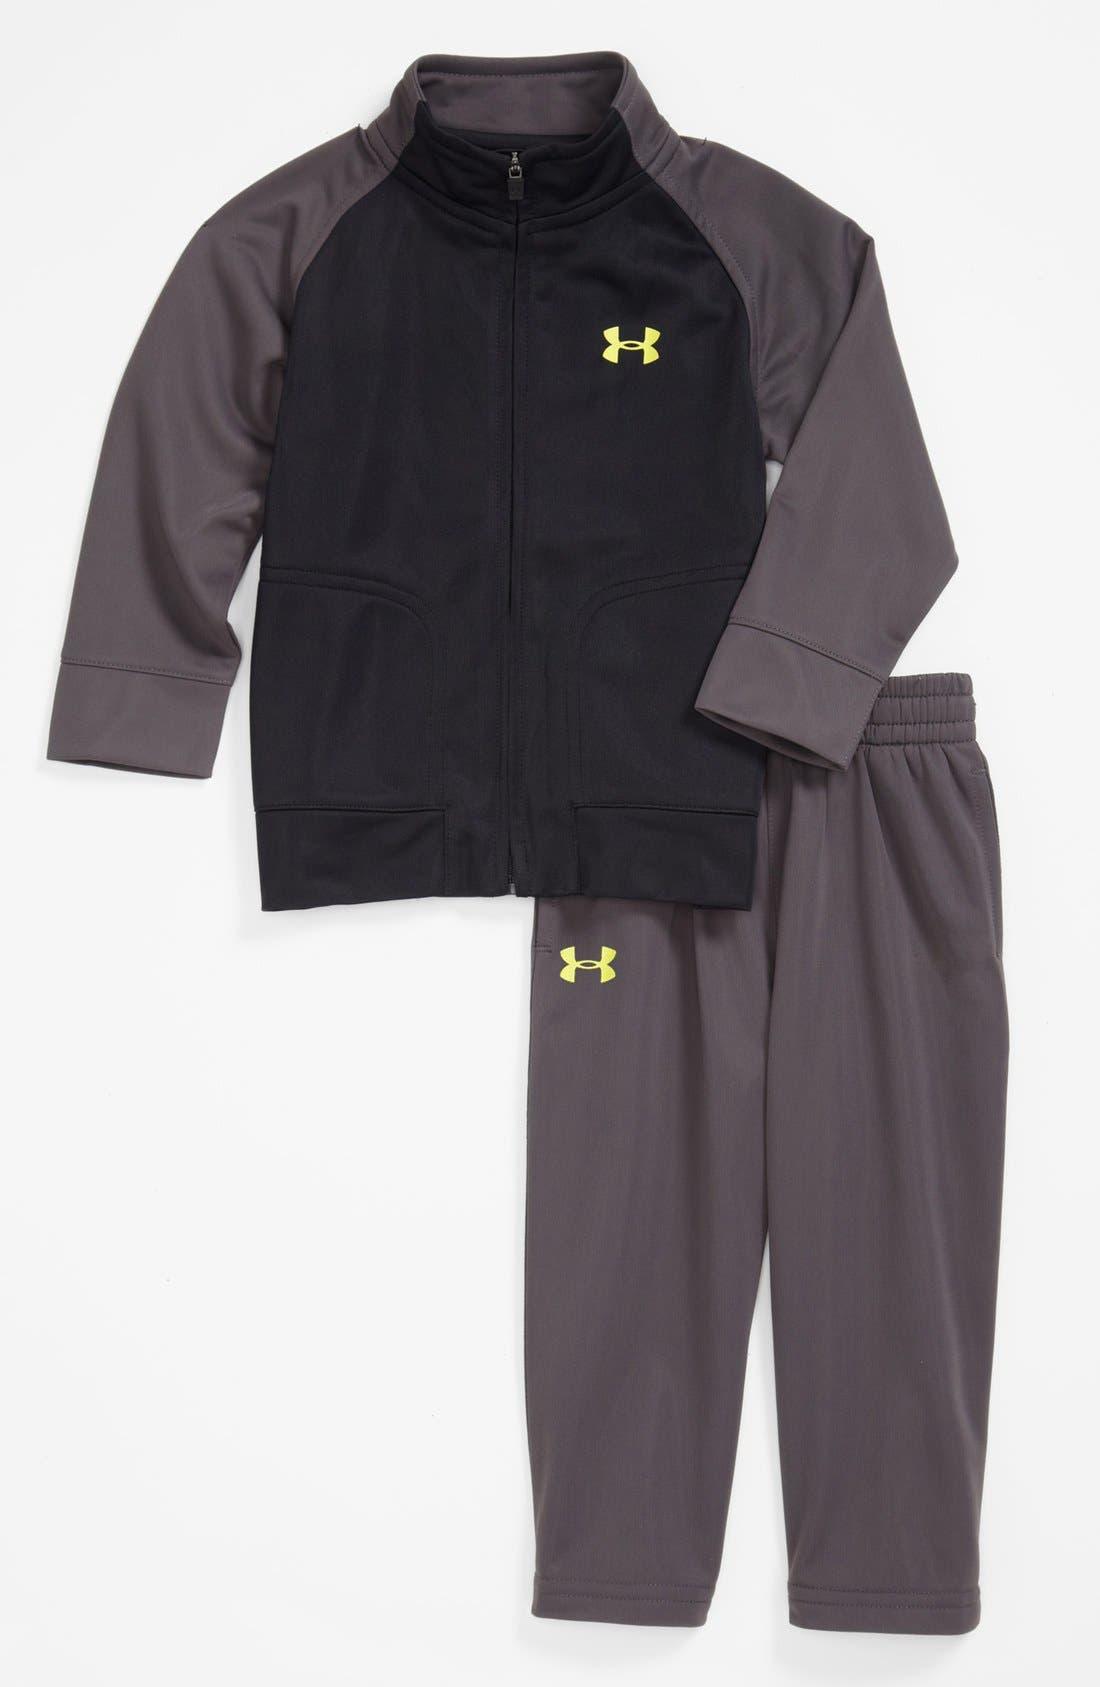 Alternate Image 1 Selected - Under Armour 'Sideline' Track Jacket & Pants (Baby Boys)